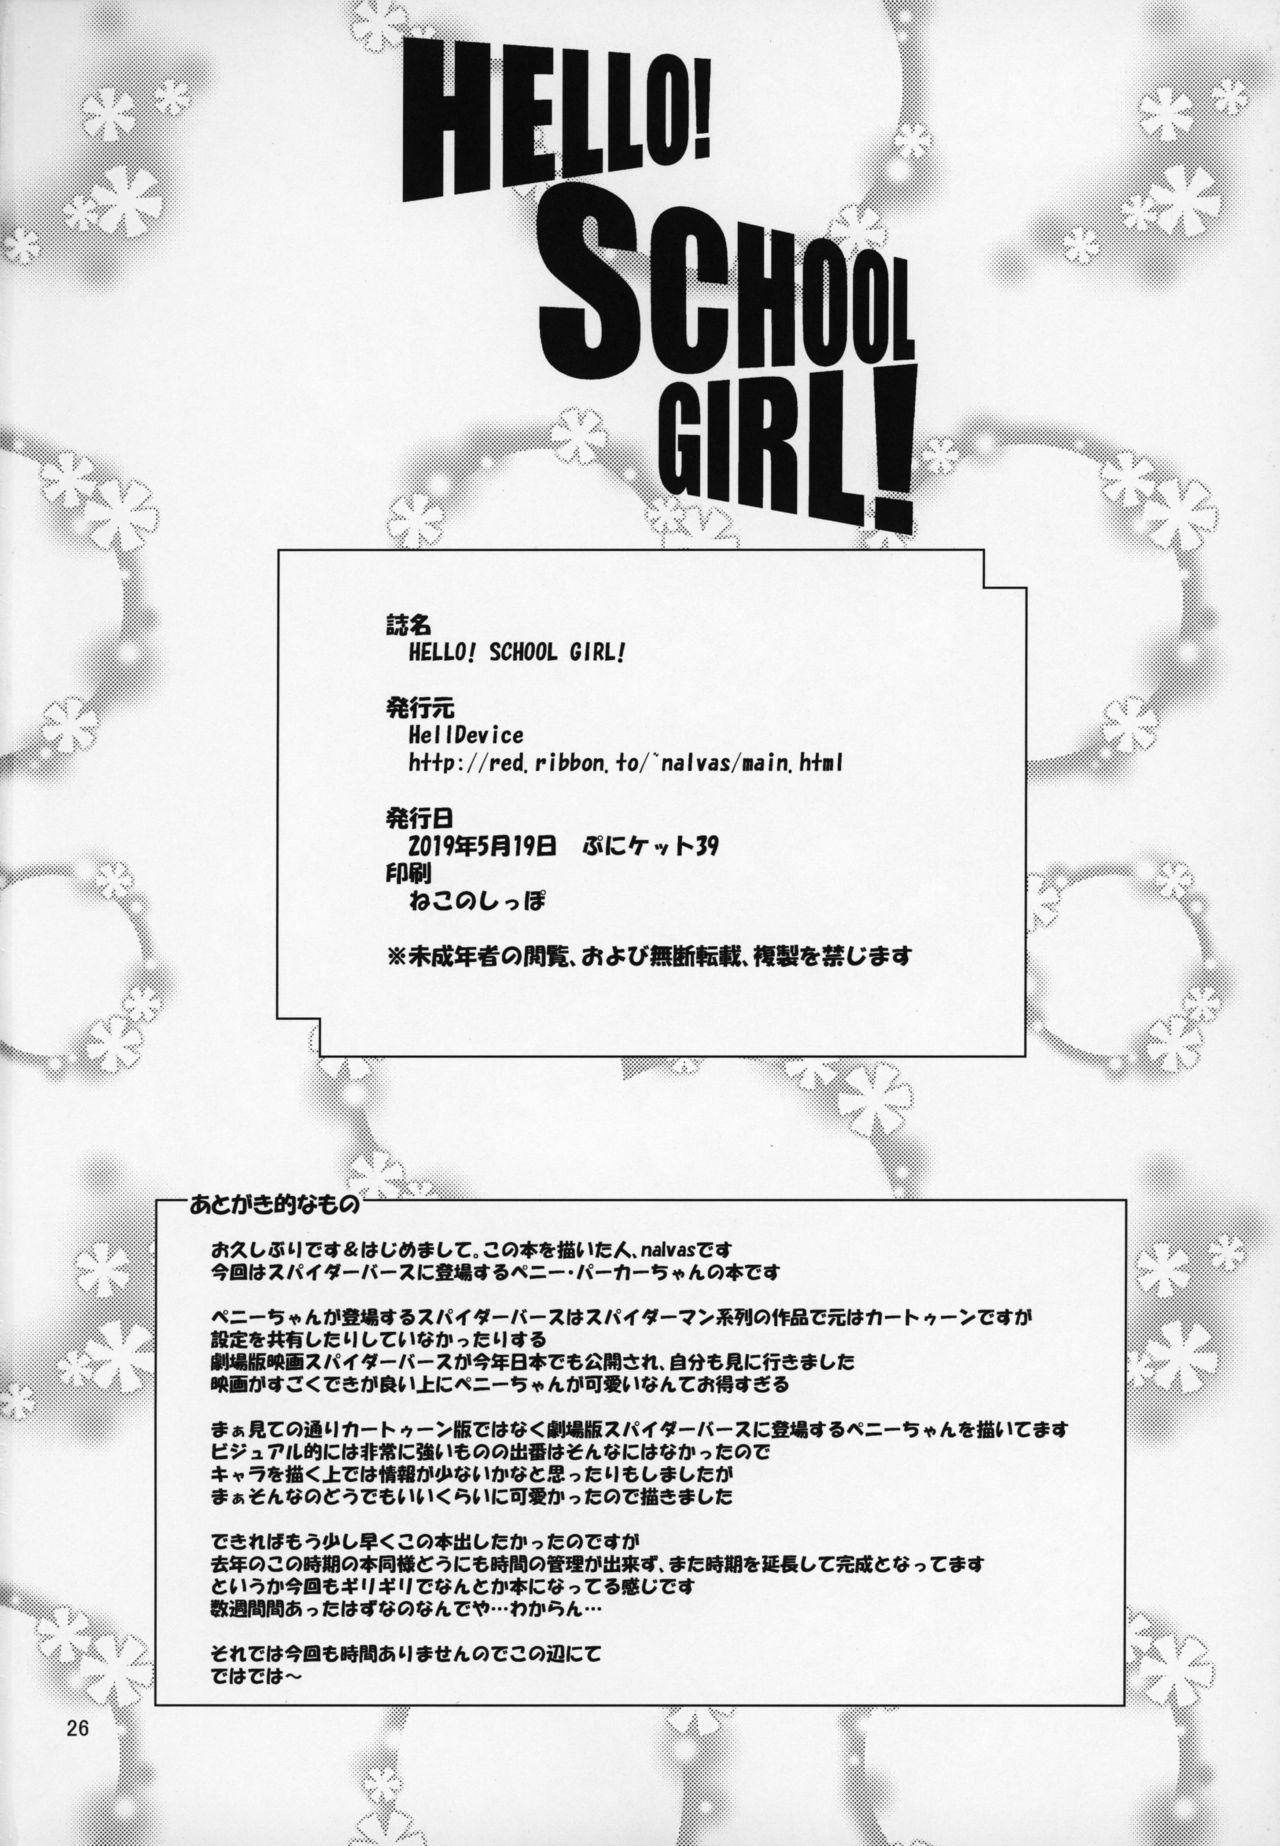 HELLO! SCHOOL GIRL! 24